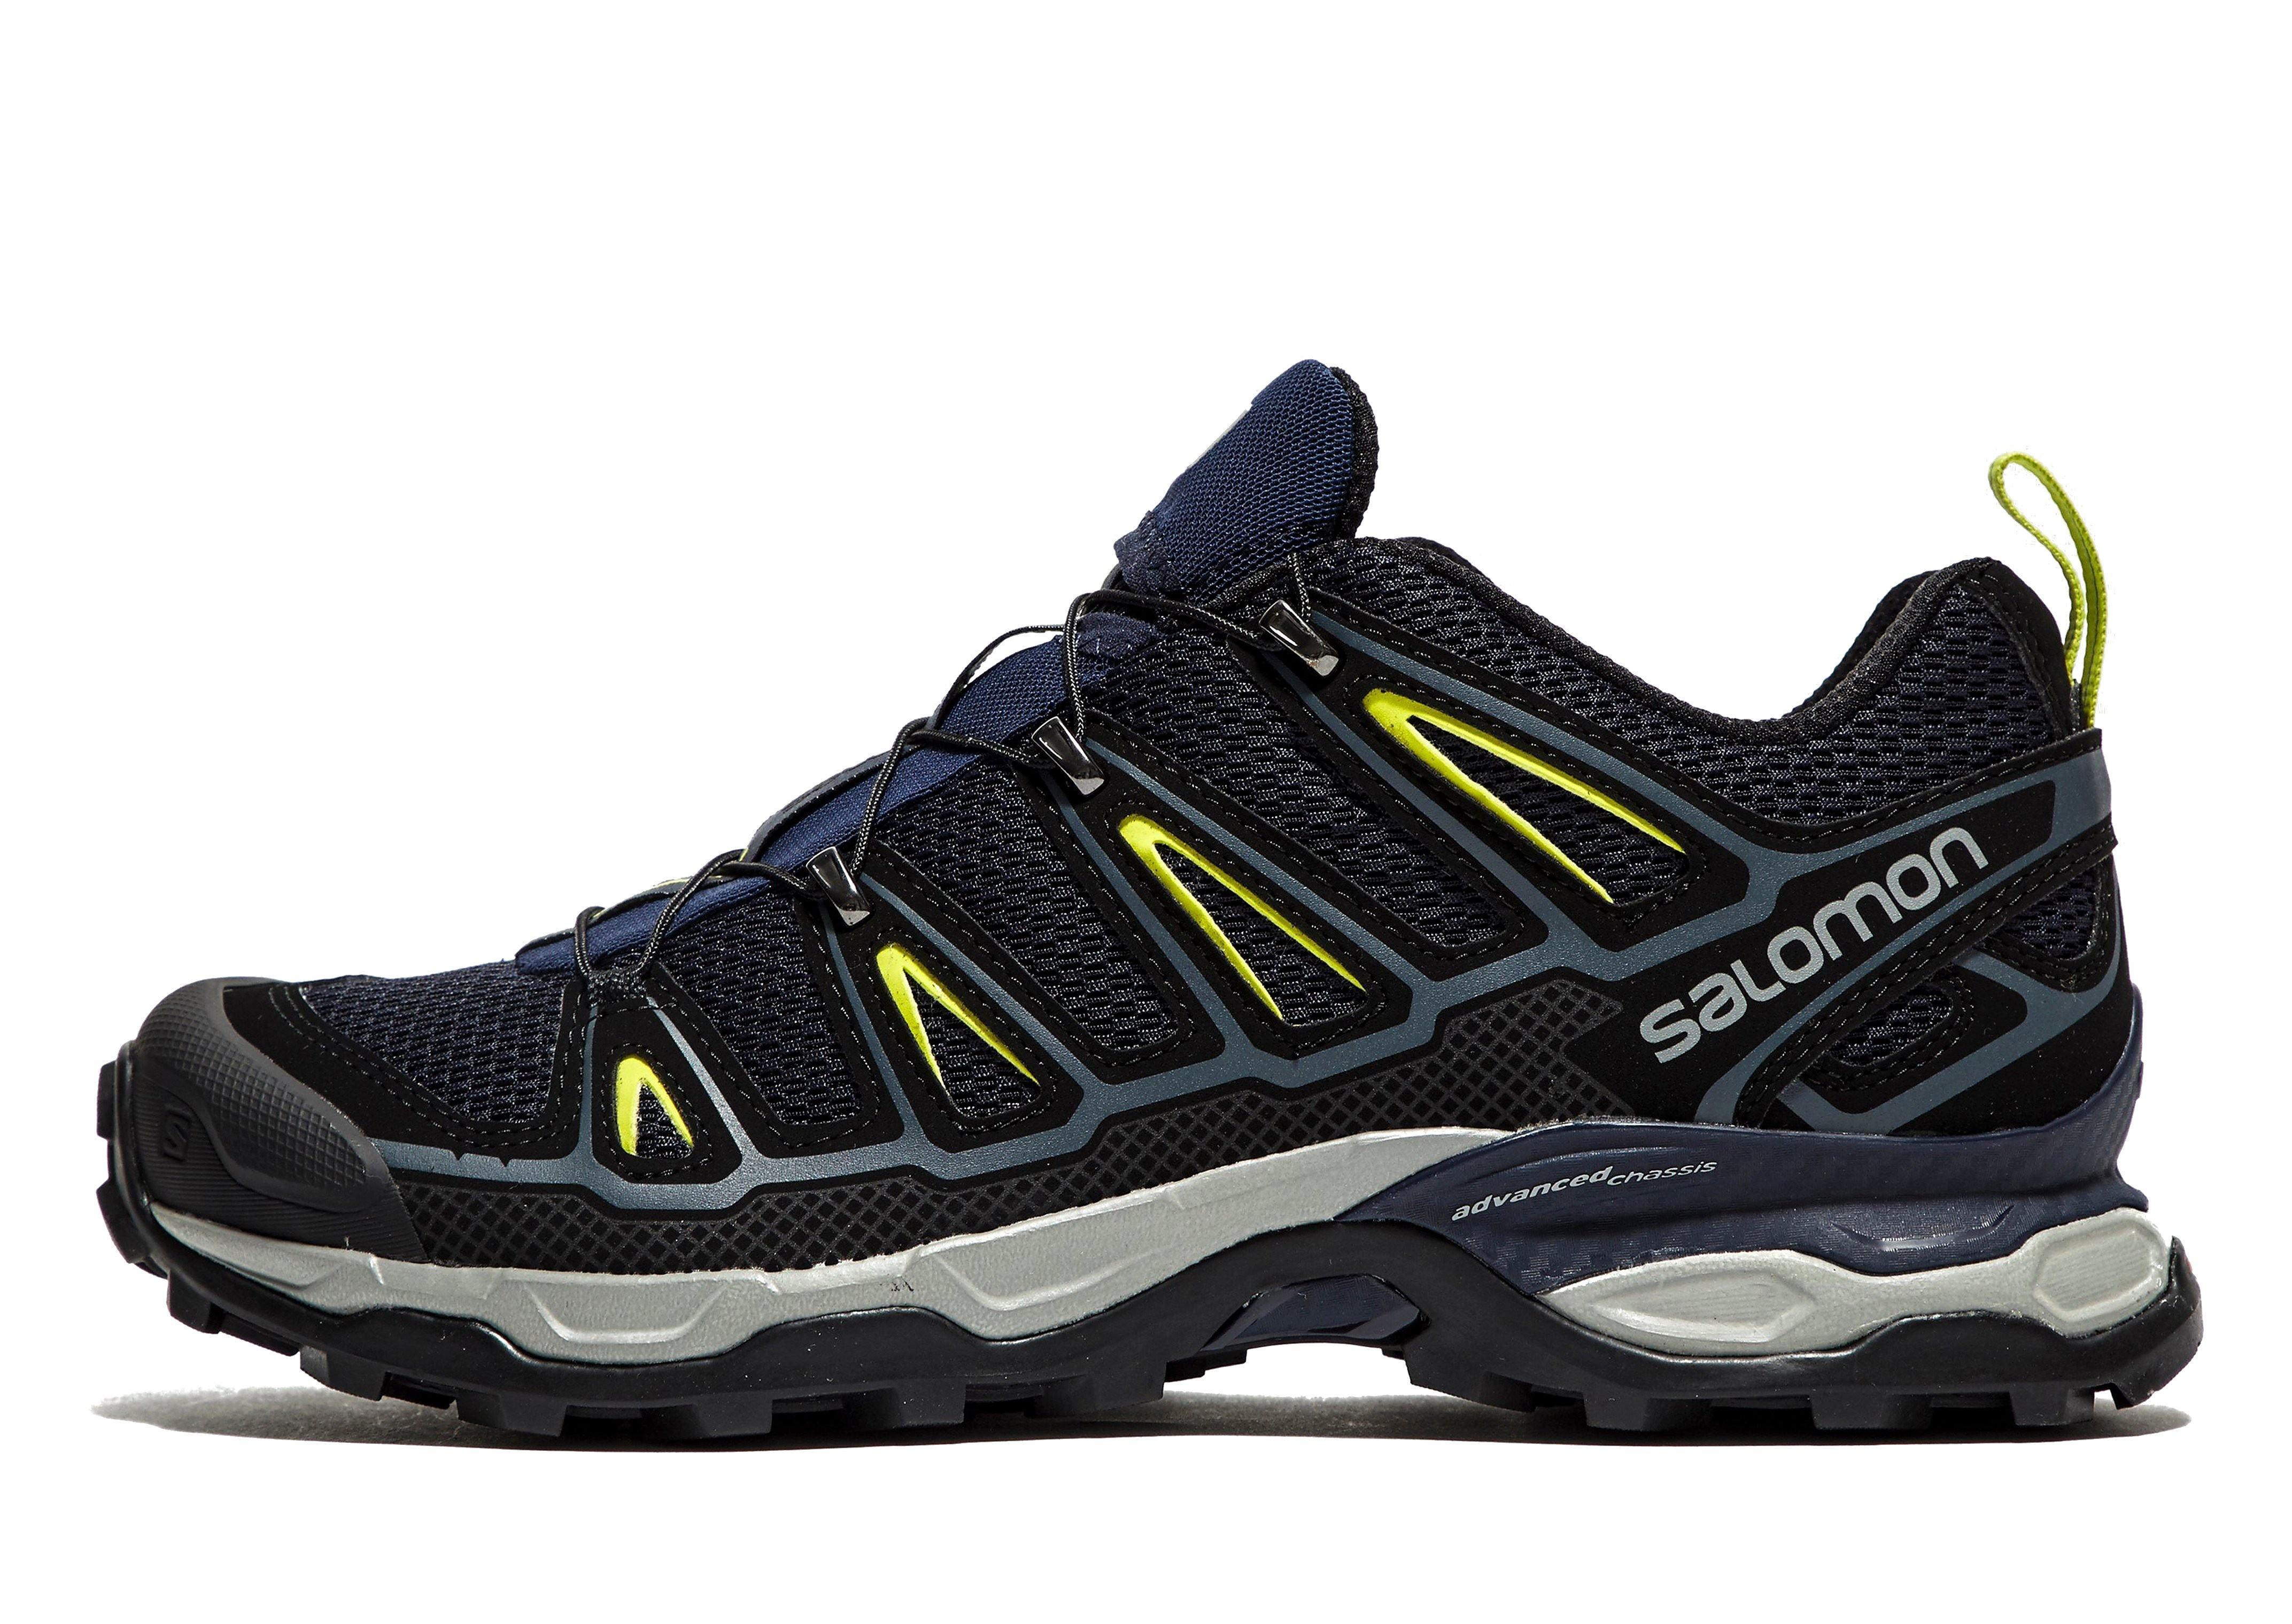 Salomon X Ultra 2 Walking Shoes